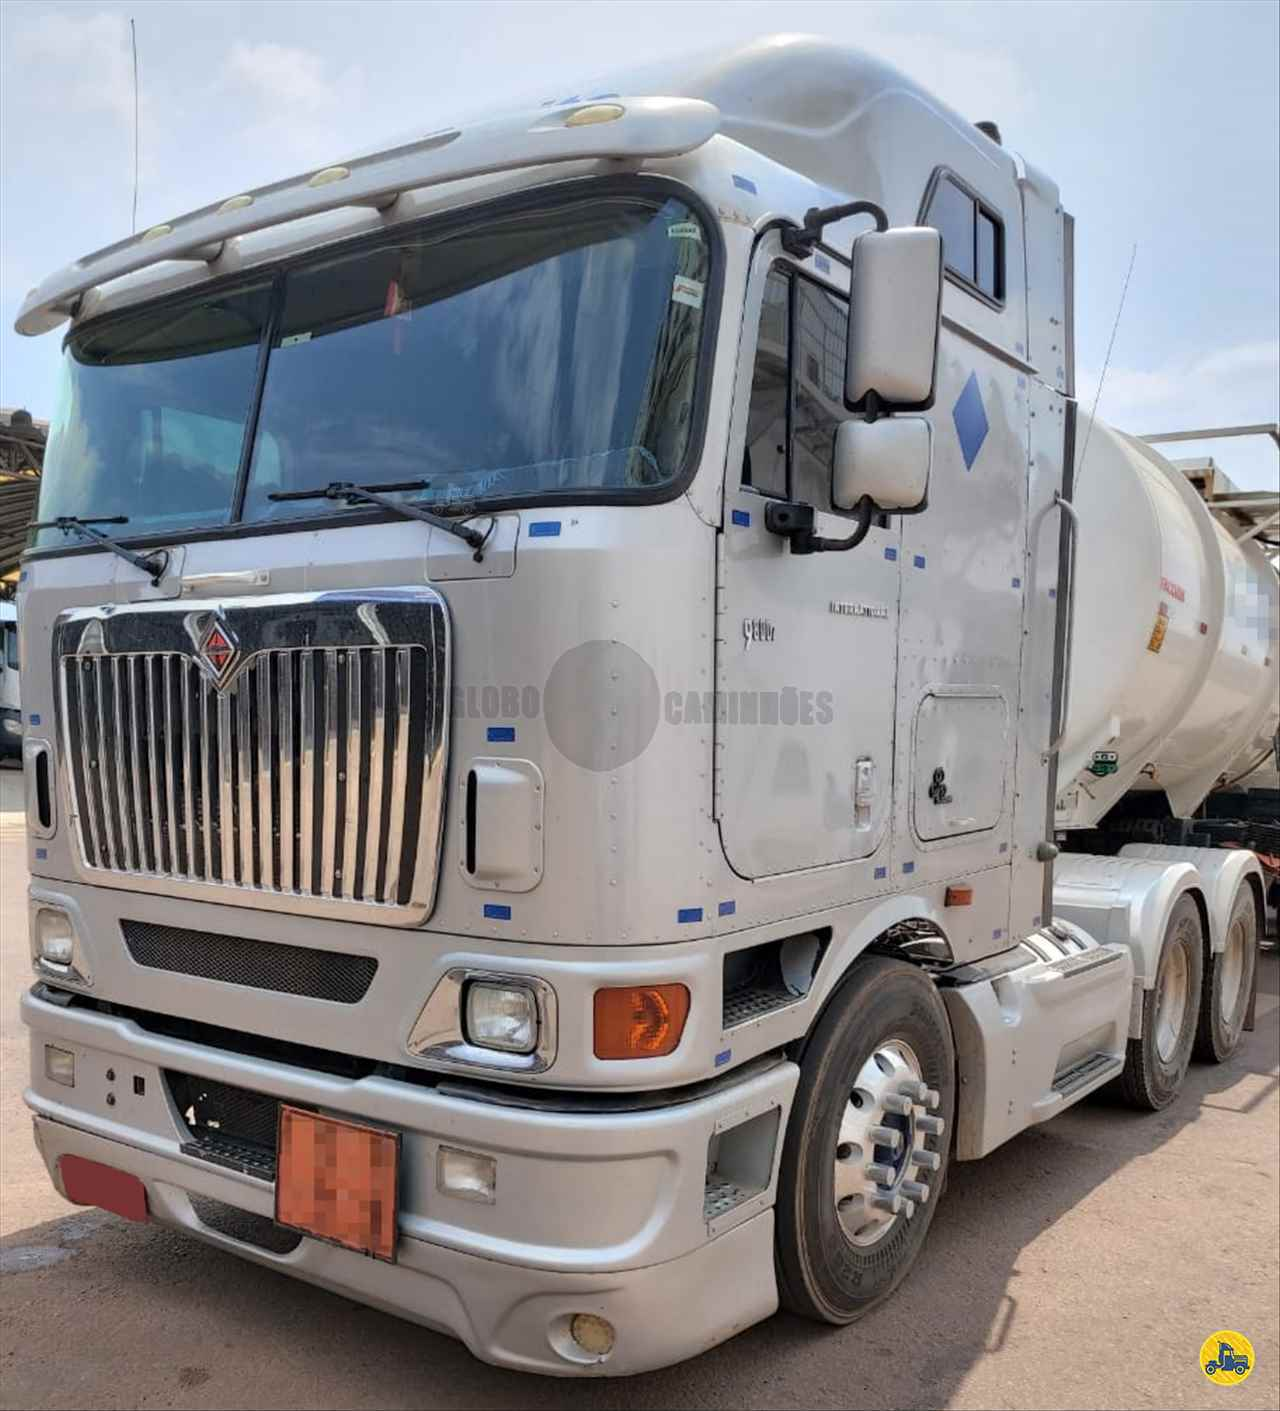 CAMINHAO INTERNATIONAL INTERNATIONAL 9800 Cavalo Mecânico Traçado 6x4 Globo Caminhões Helio Maringá MARINGA PARANÁ PR